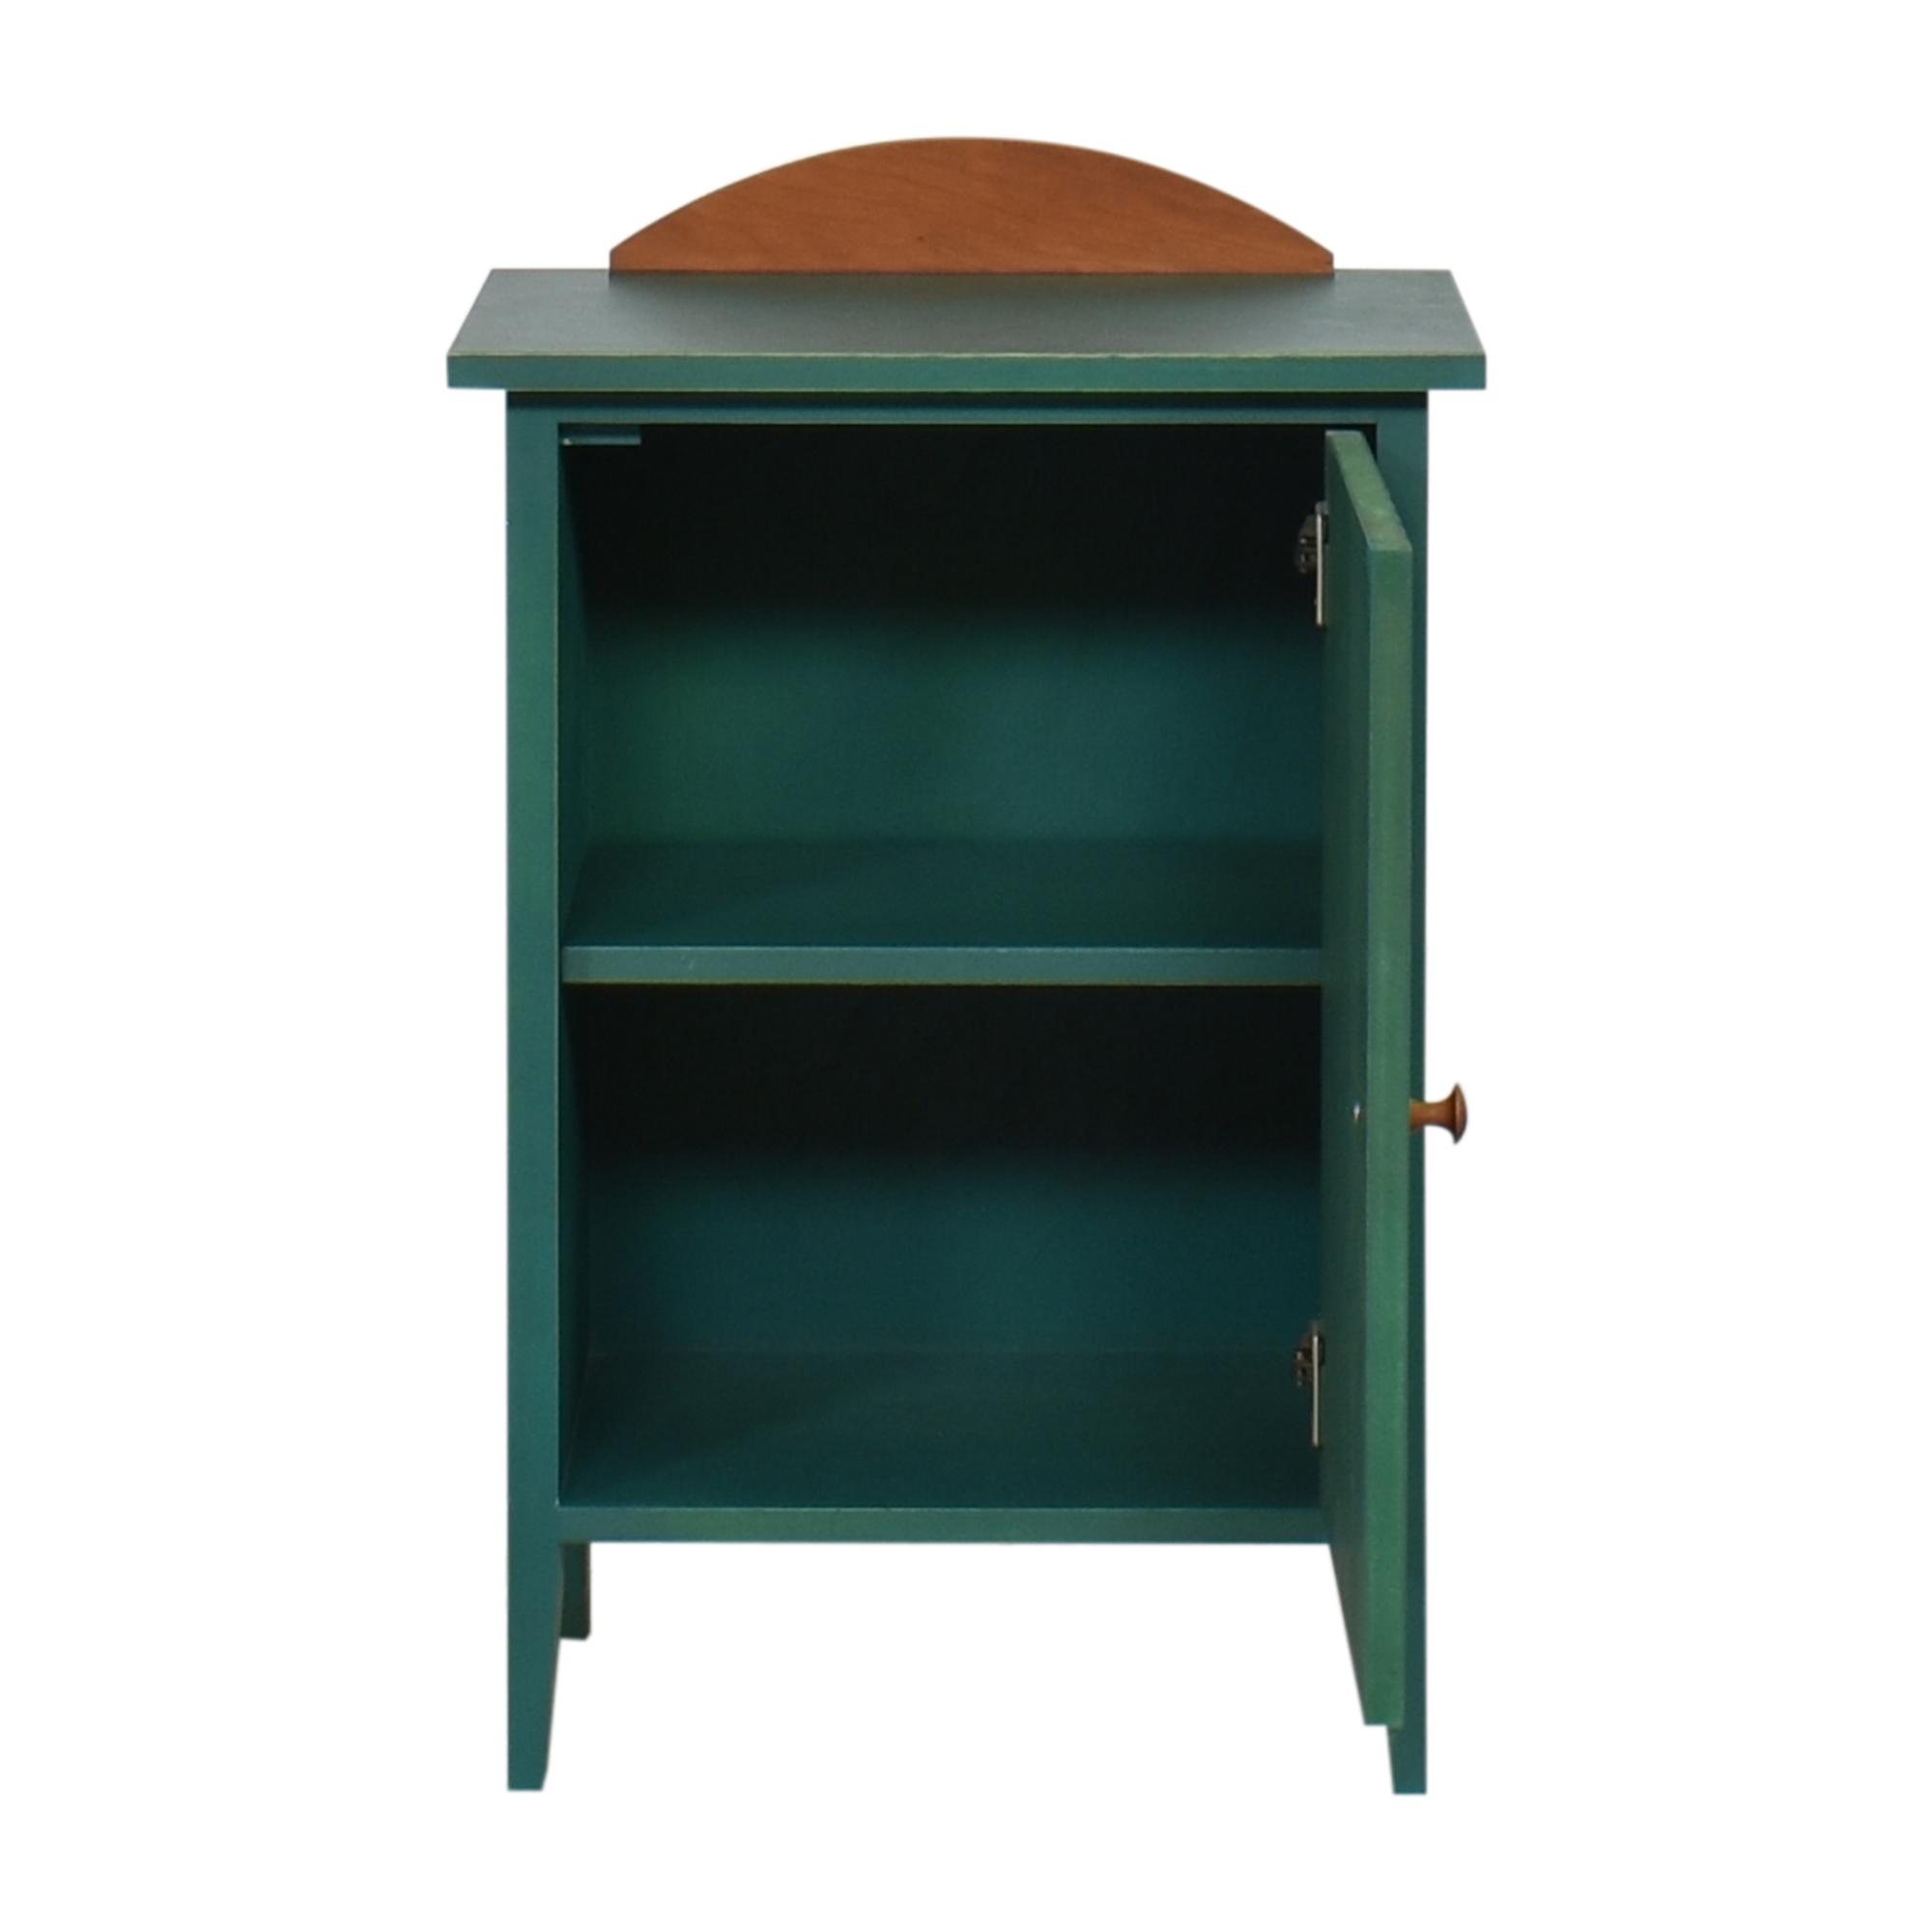 Maine Cottage Maine Cottage Island Bedside Cabinet nj